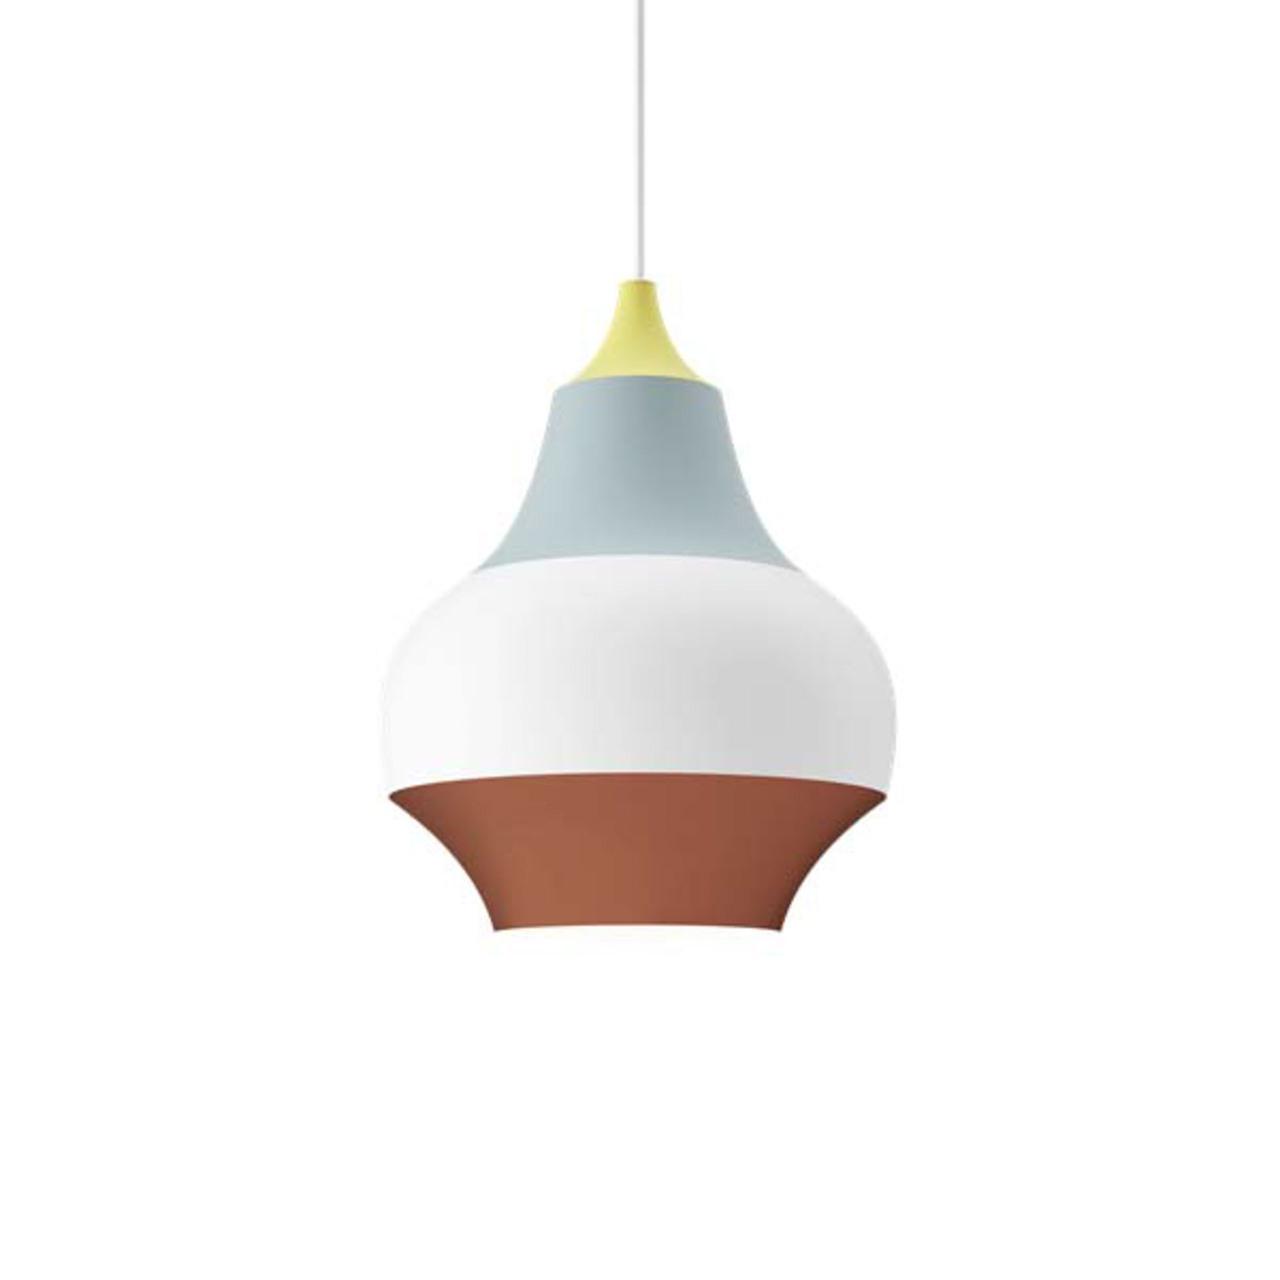 Louis Poulsen Lampe 'Cirque' Ø: 15 cm, Gelb